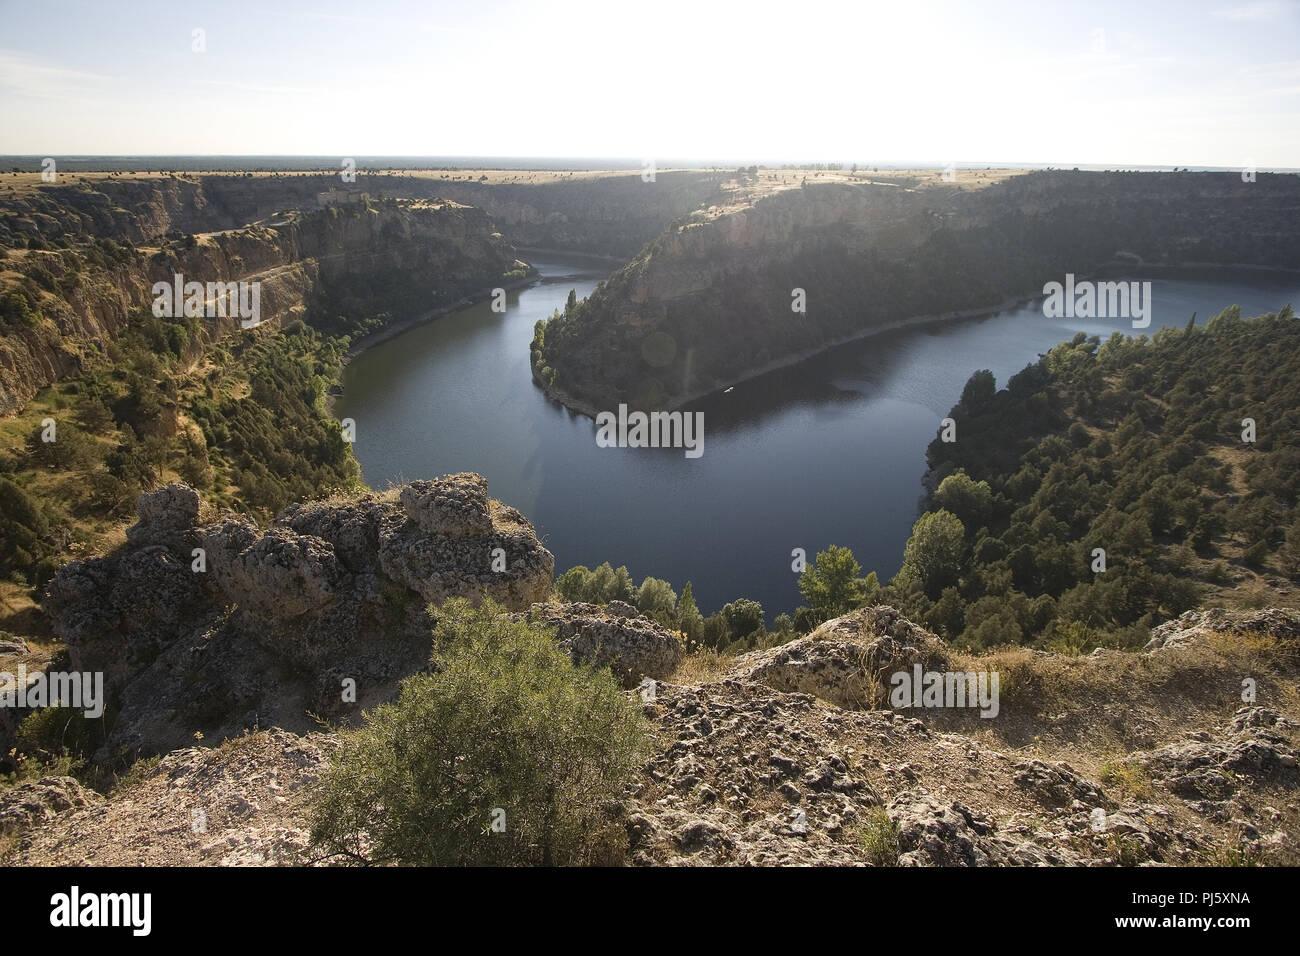 Duraton river and San Frutos Monastery, Duraton, Segovia. Hoces del Duraton natural park. Segovia. Castilla y Leon. Spain - Stock Image